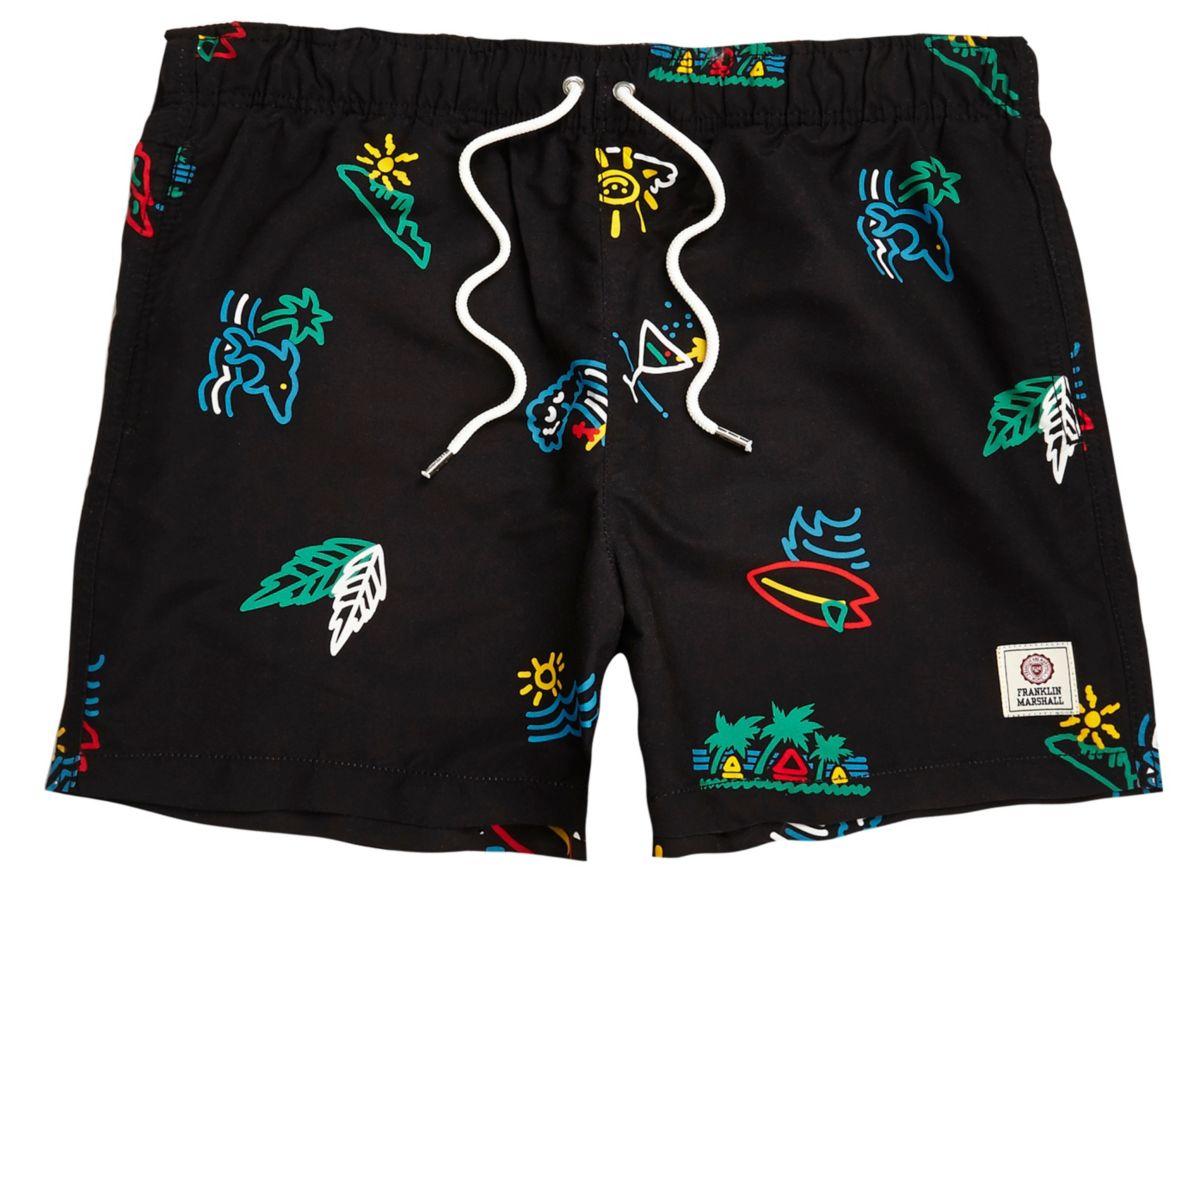 Black Franklin & Marshall print swim trunks